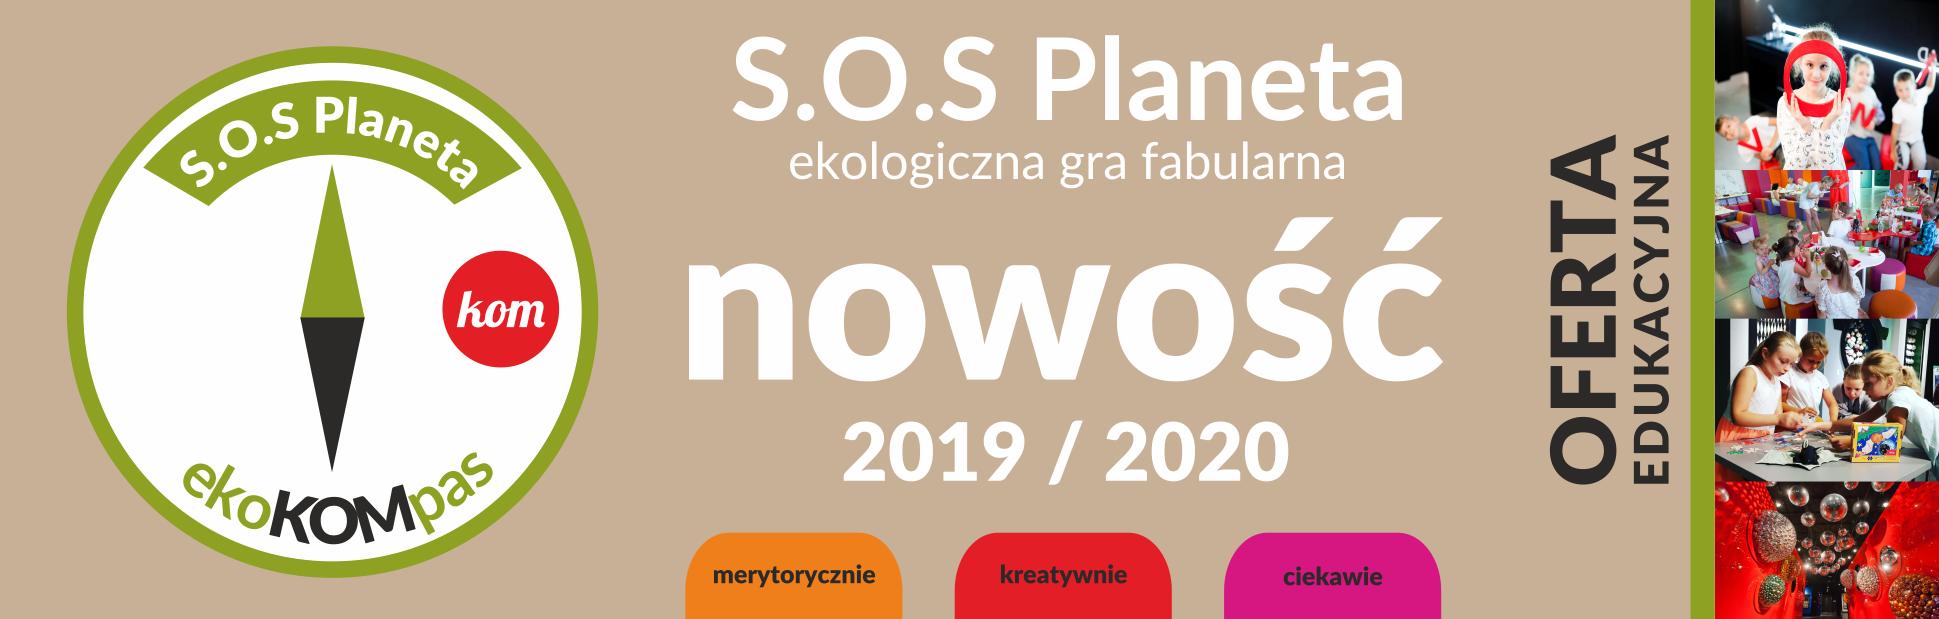 slider nowego progamu edukacyjnego - SOS Planeta